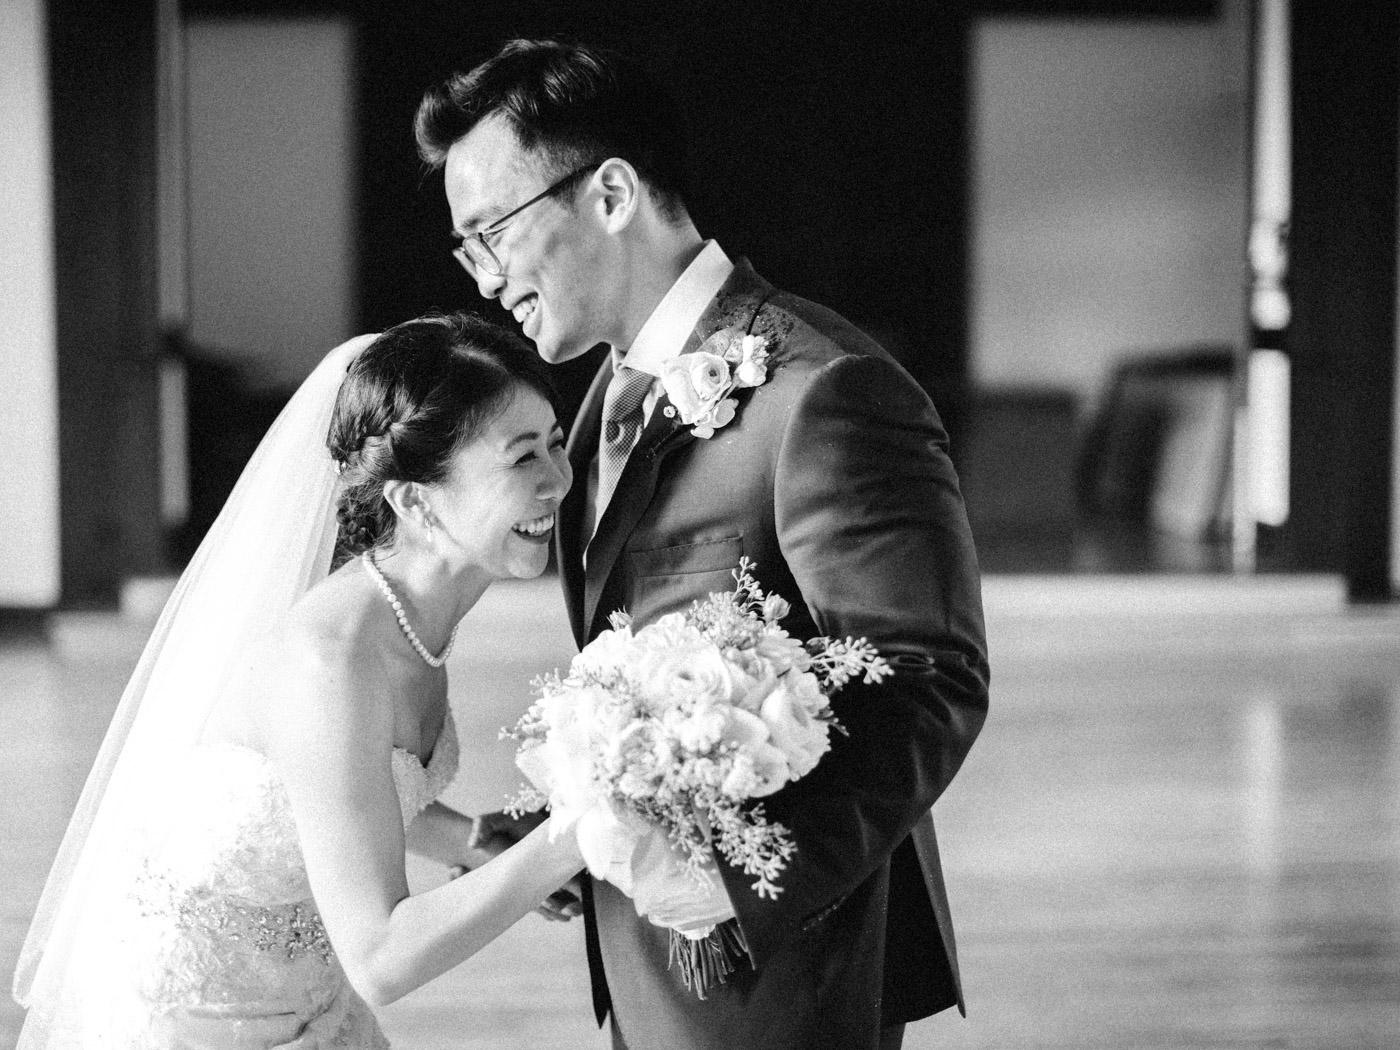 toronto_wedding_photographer_fine_art_documentary_photography-79.jpg